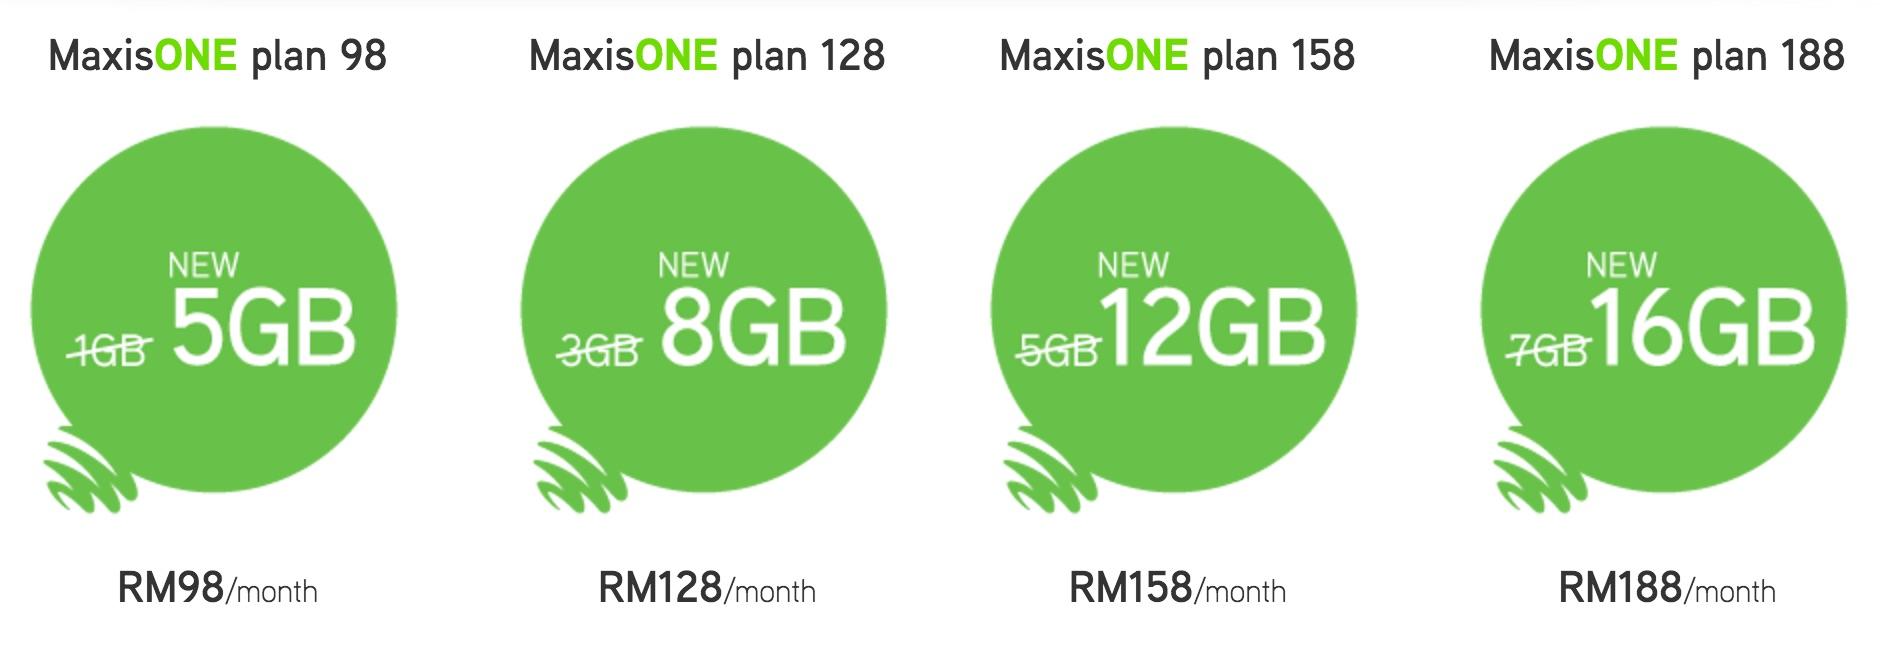 New MaxisONE Plan announced by Maxis CEO